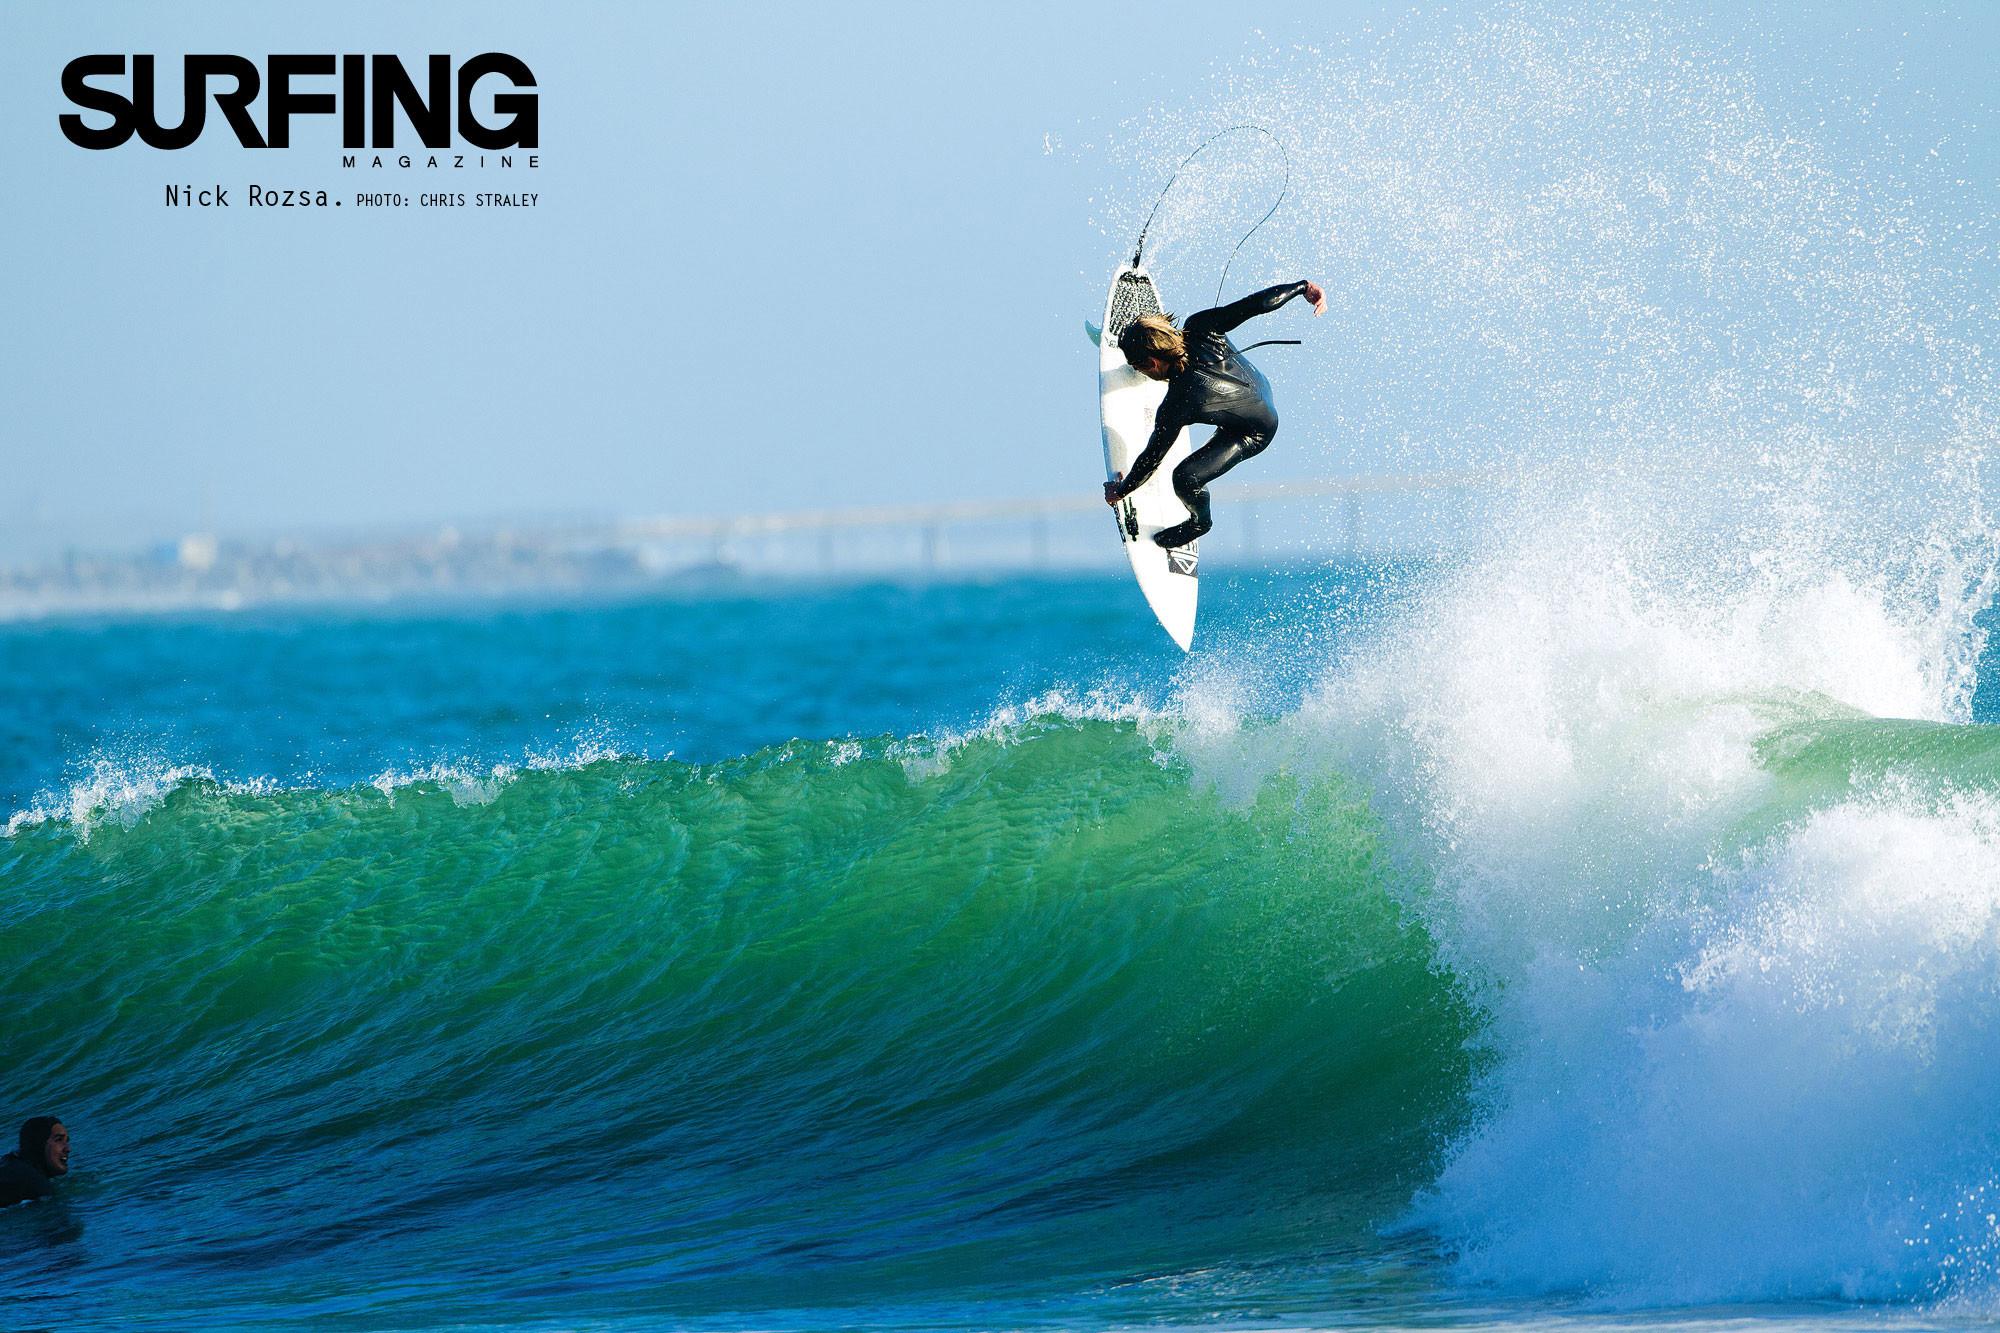 surfing desktop wallpaper nick rosza chris straley surfing magazine 610×406  SURFING Magazine May 2012 Wallpaper